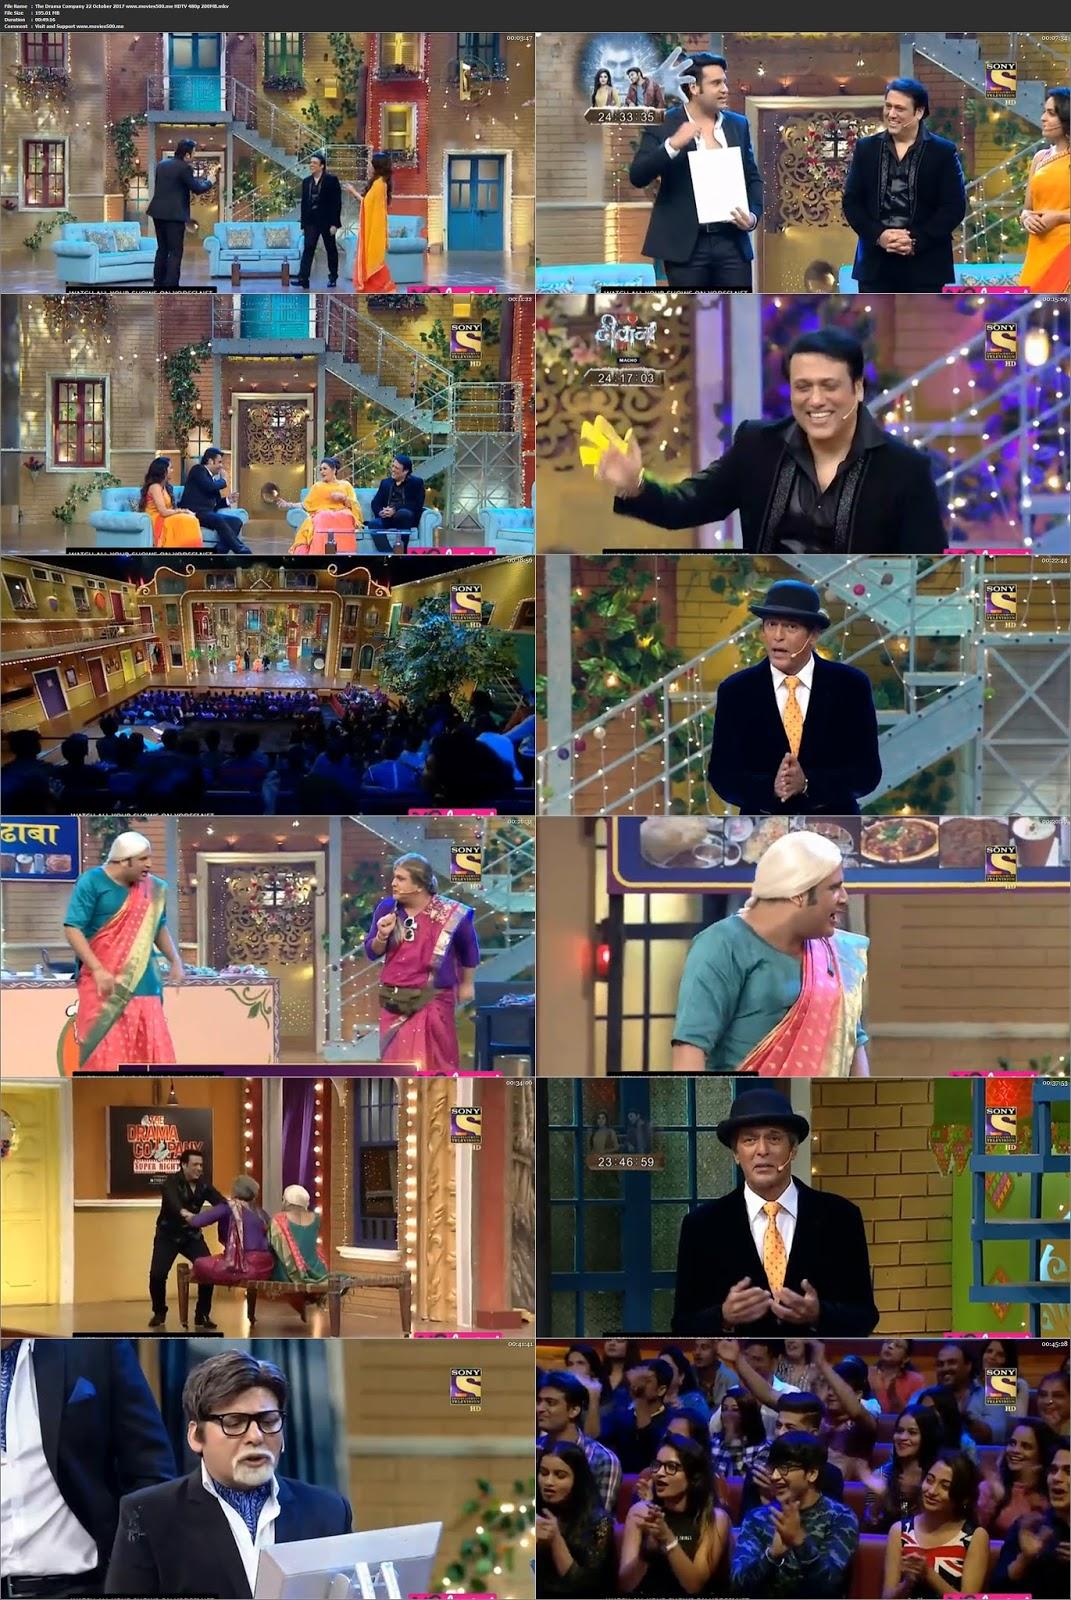 The Drama Company 22 October 2017 Full Show 195MB HDTV 480p at s400.bet